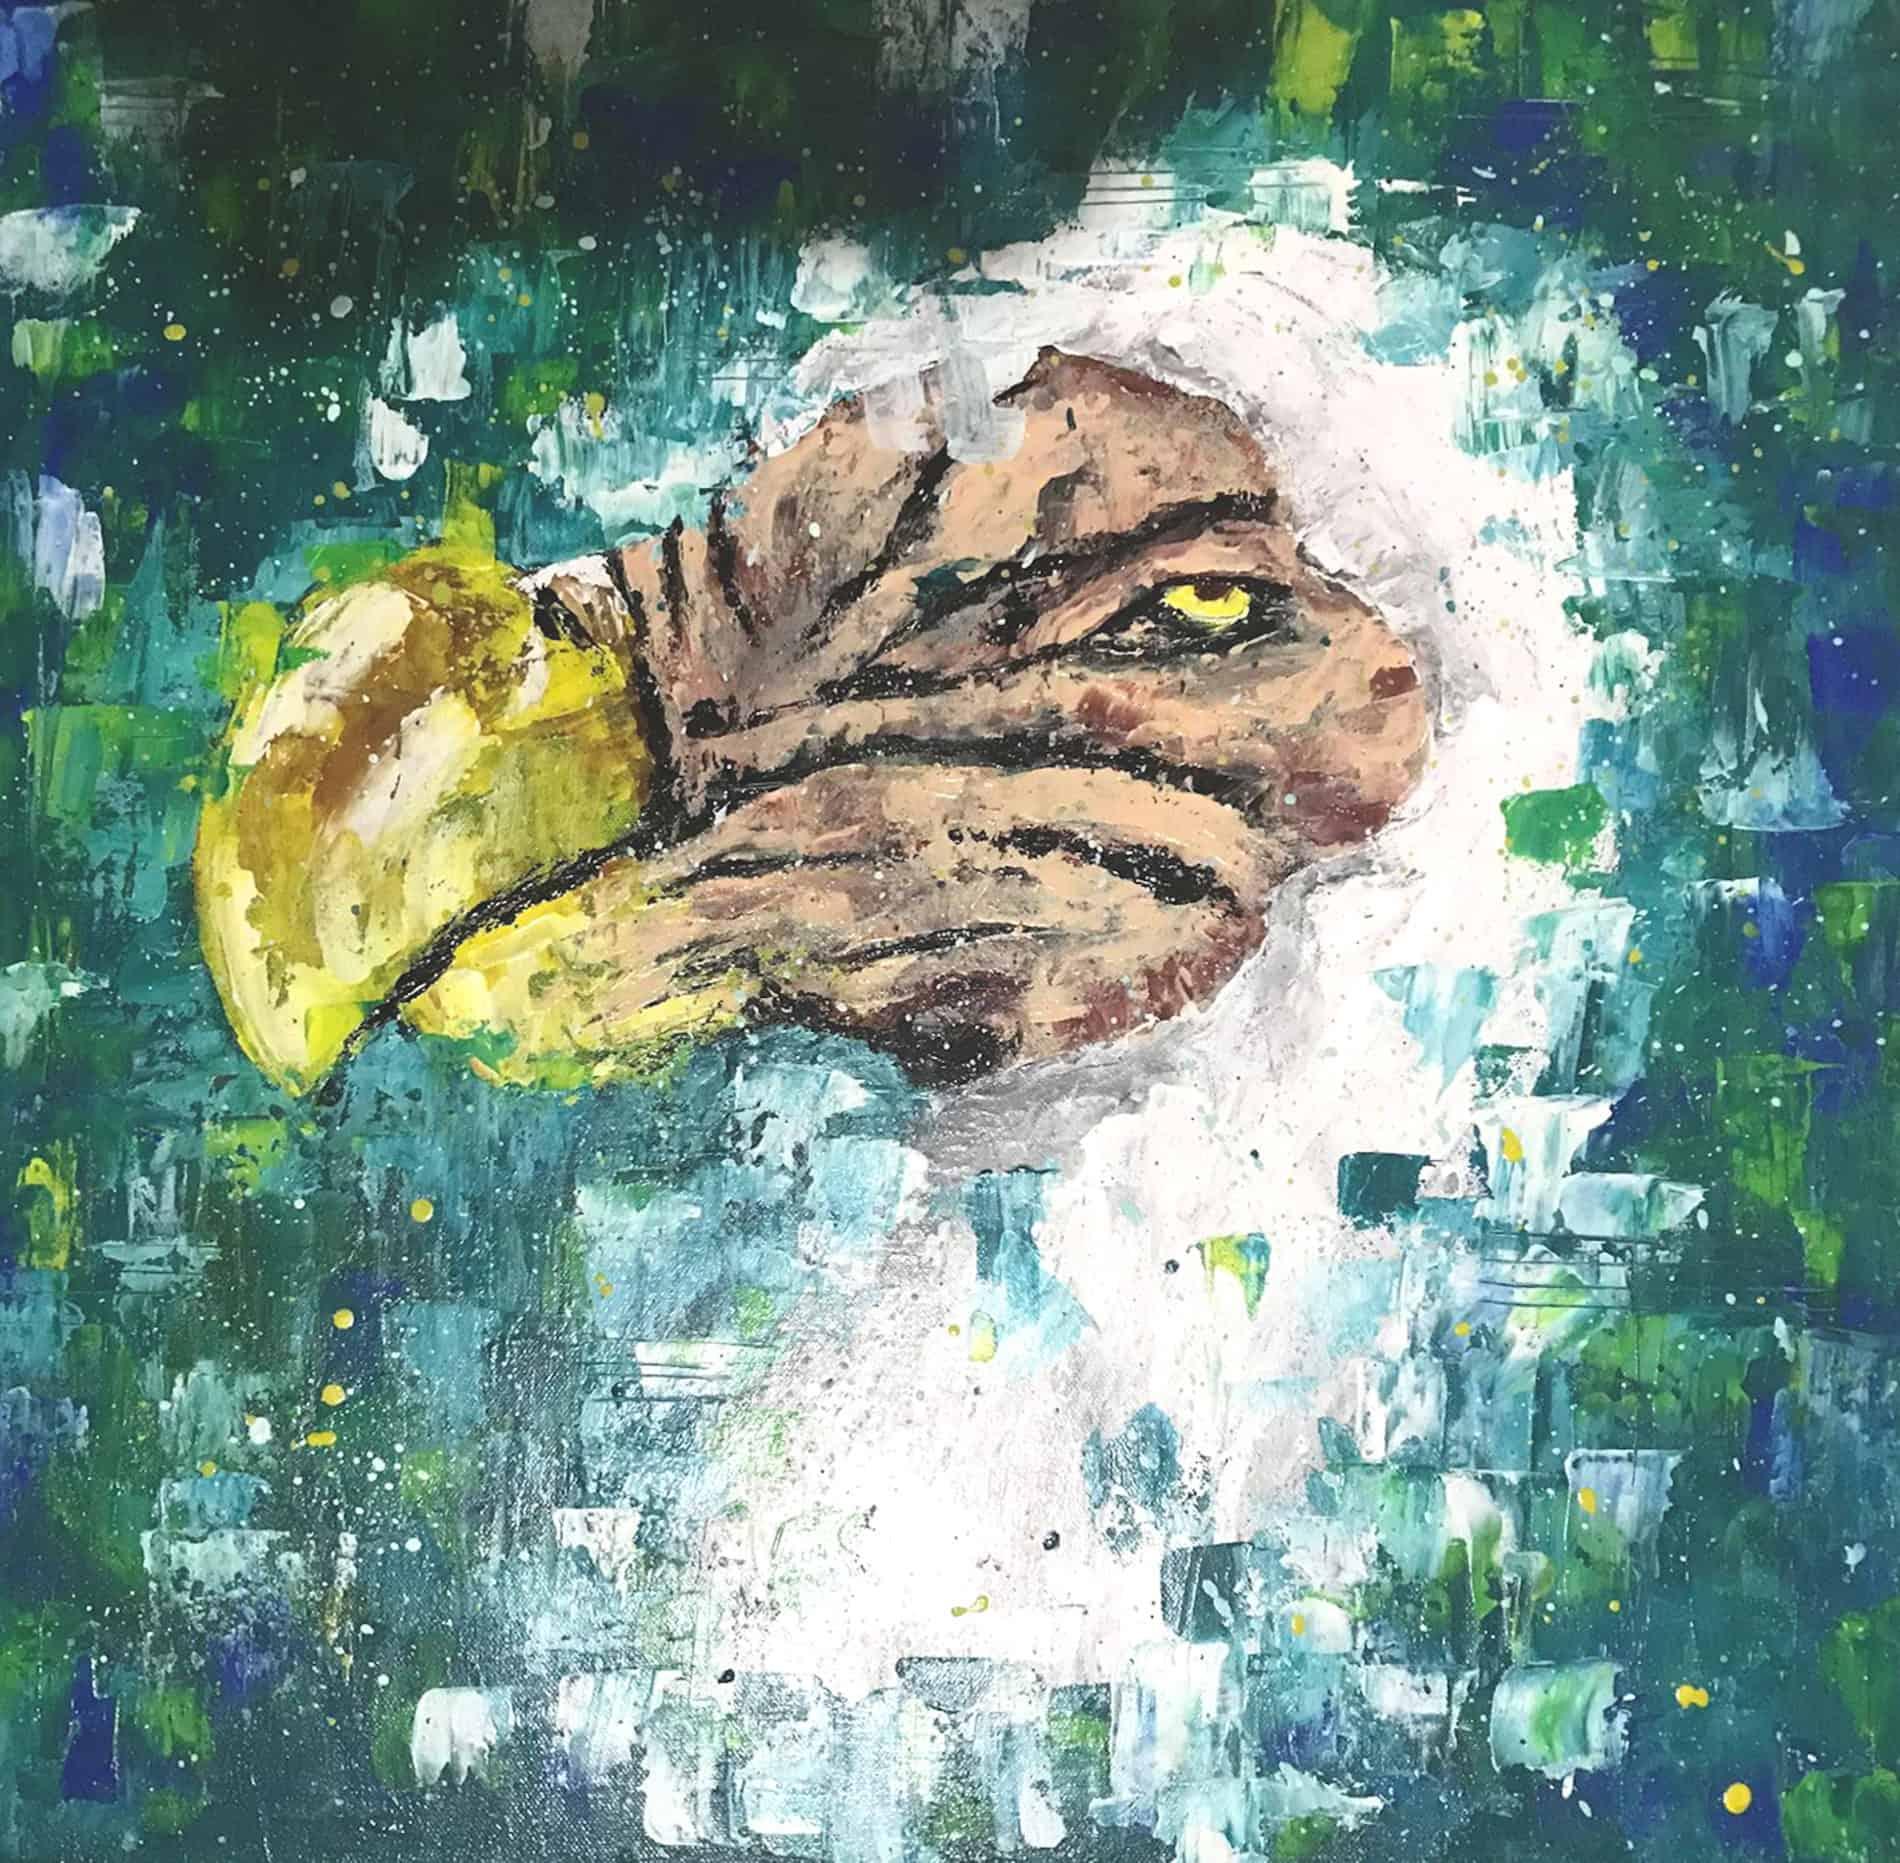 mauritius_arts_lauredy_louise_proud_dodo